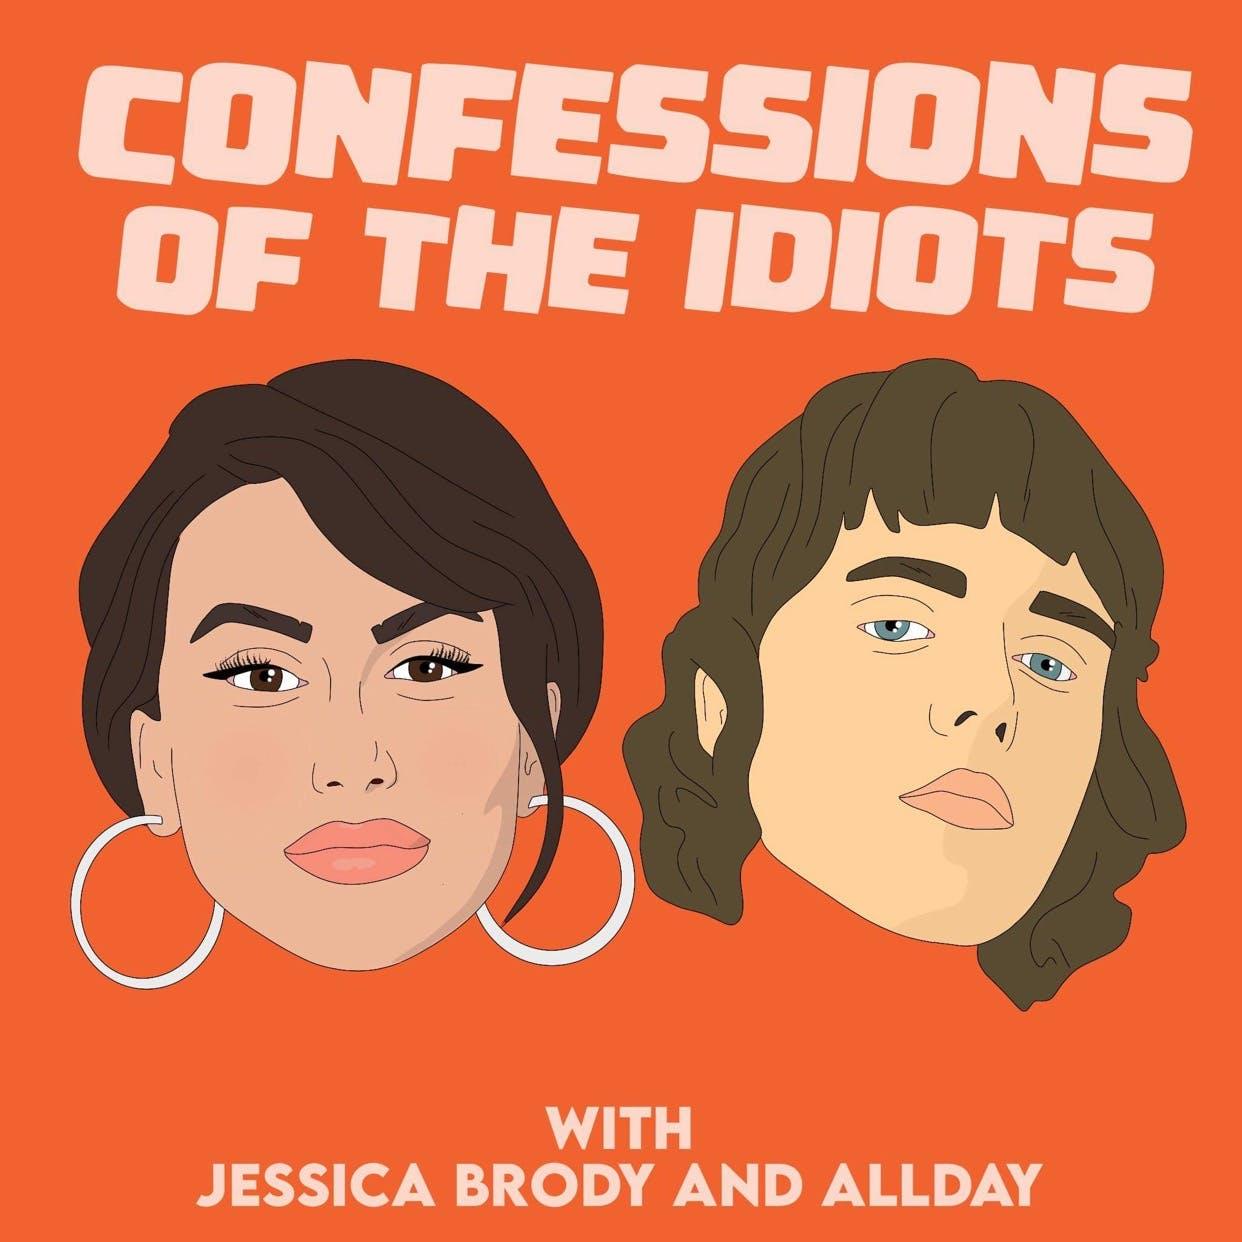 Allday & Jessica Brody